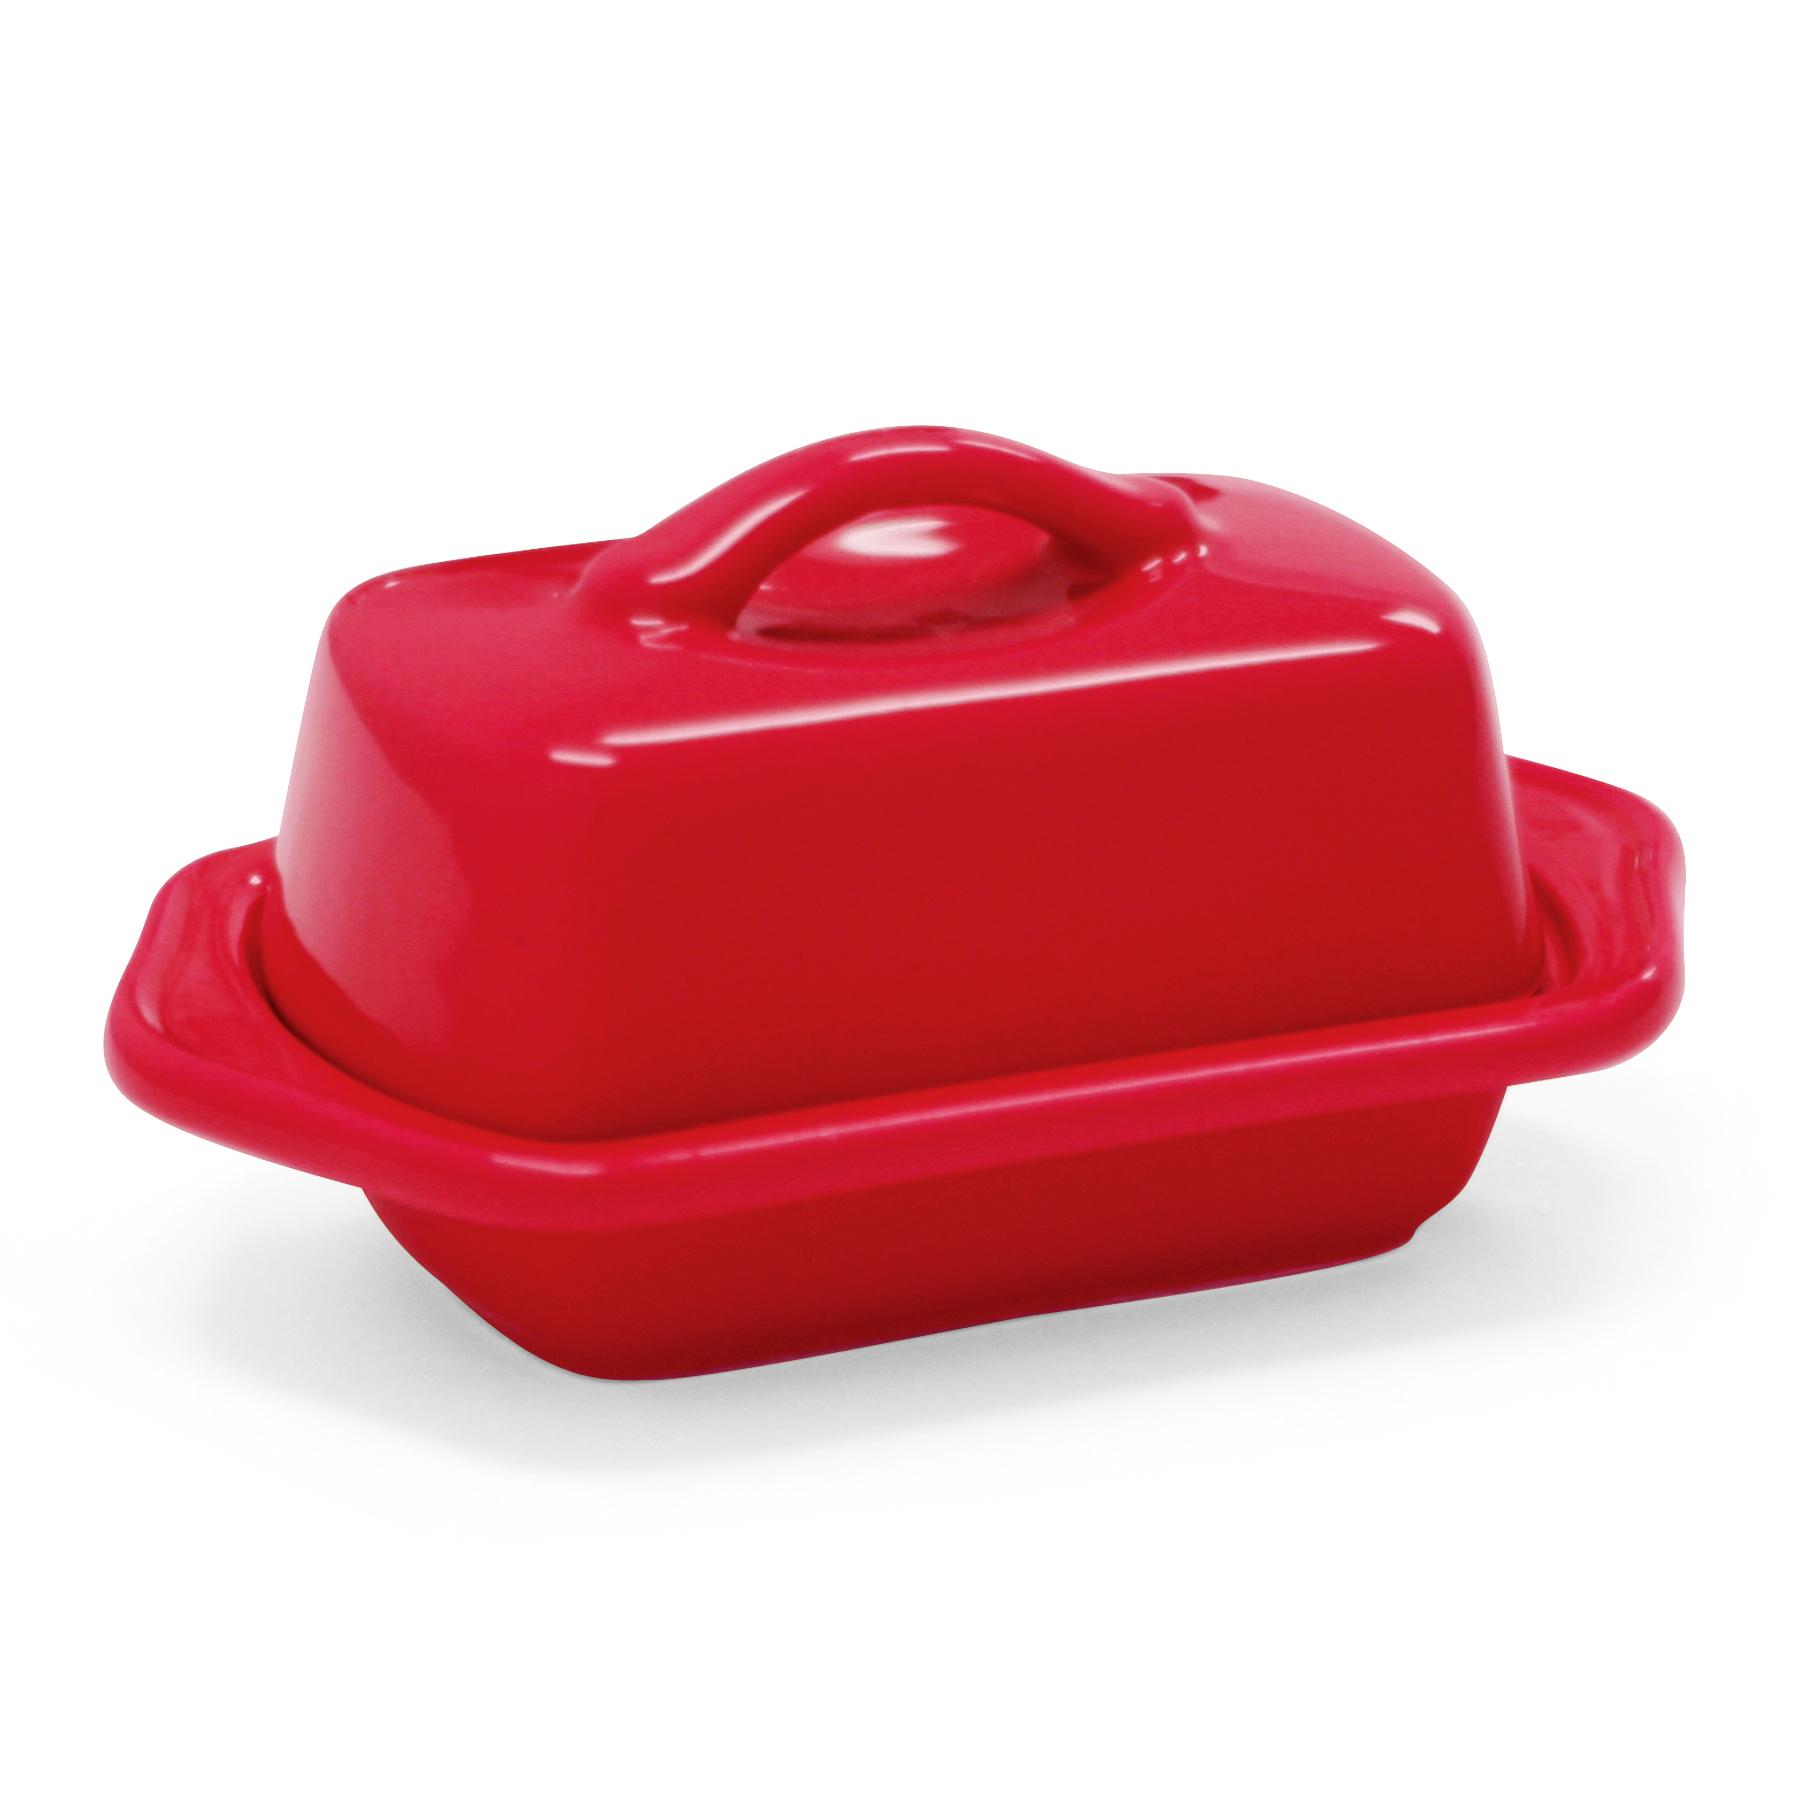 Chantal True Red Stoneware Mini 5 Inch Butter Dish